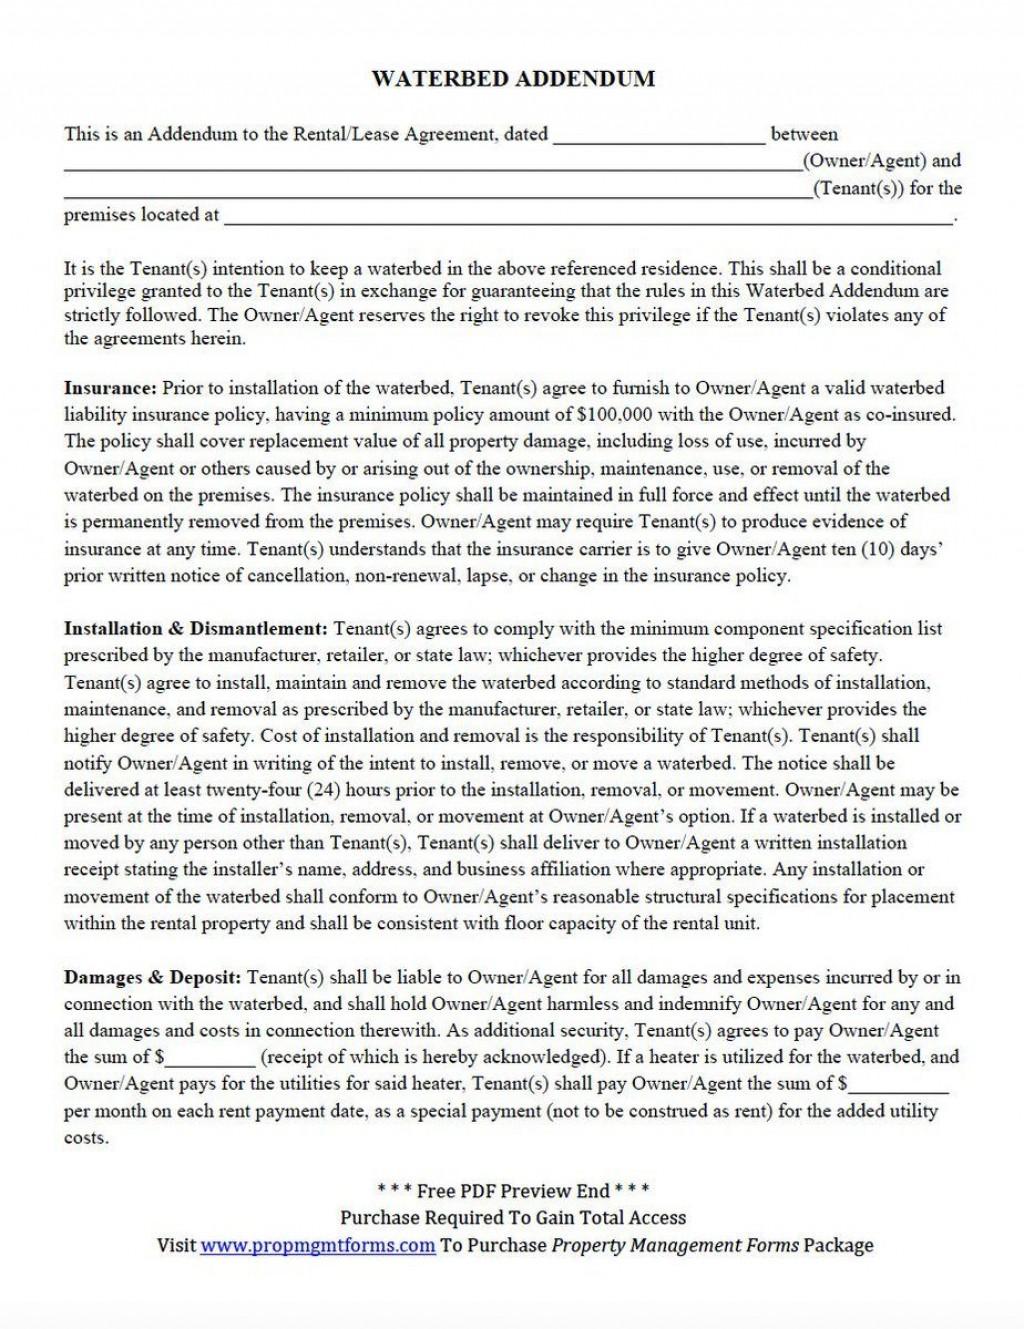 001 Top Addendum Form For Rental Agreement Idea Large